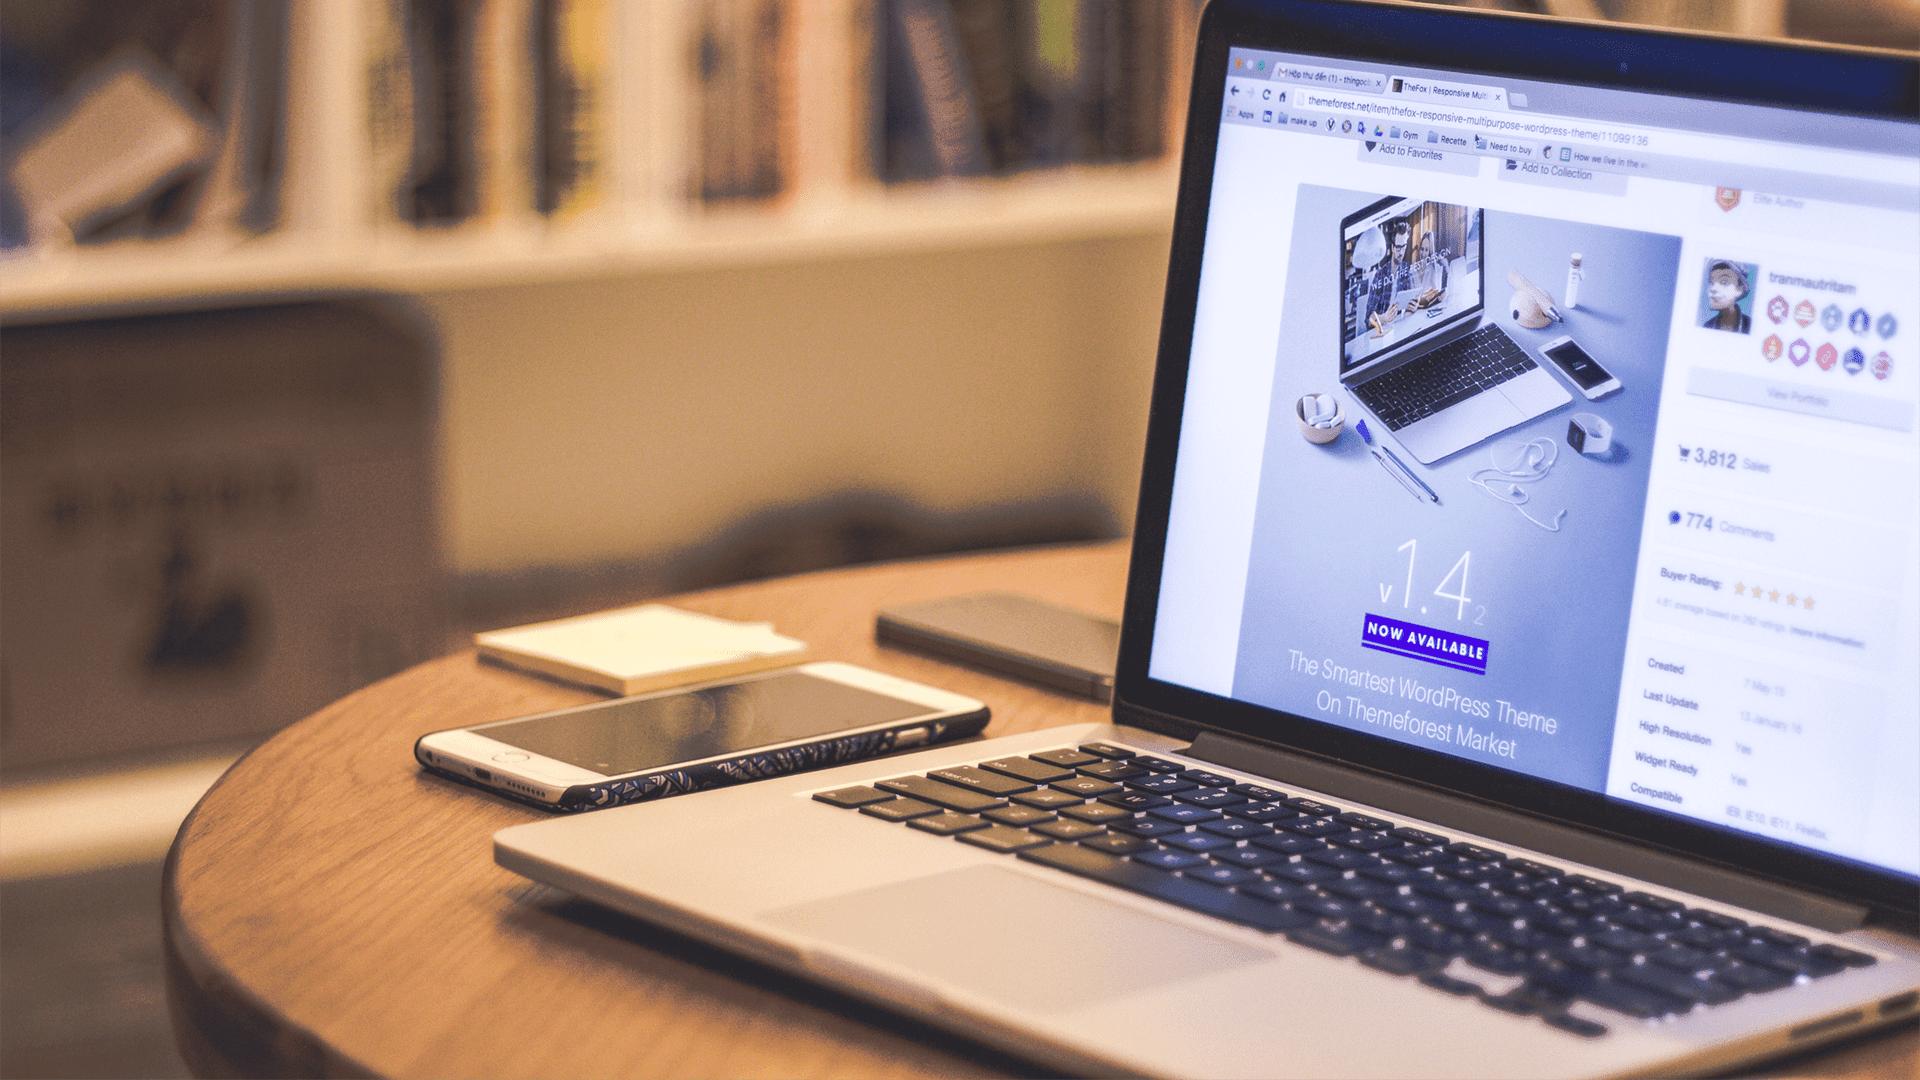 20 web design principles to follow featured image